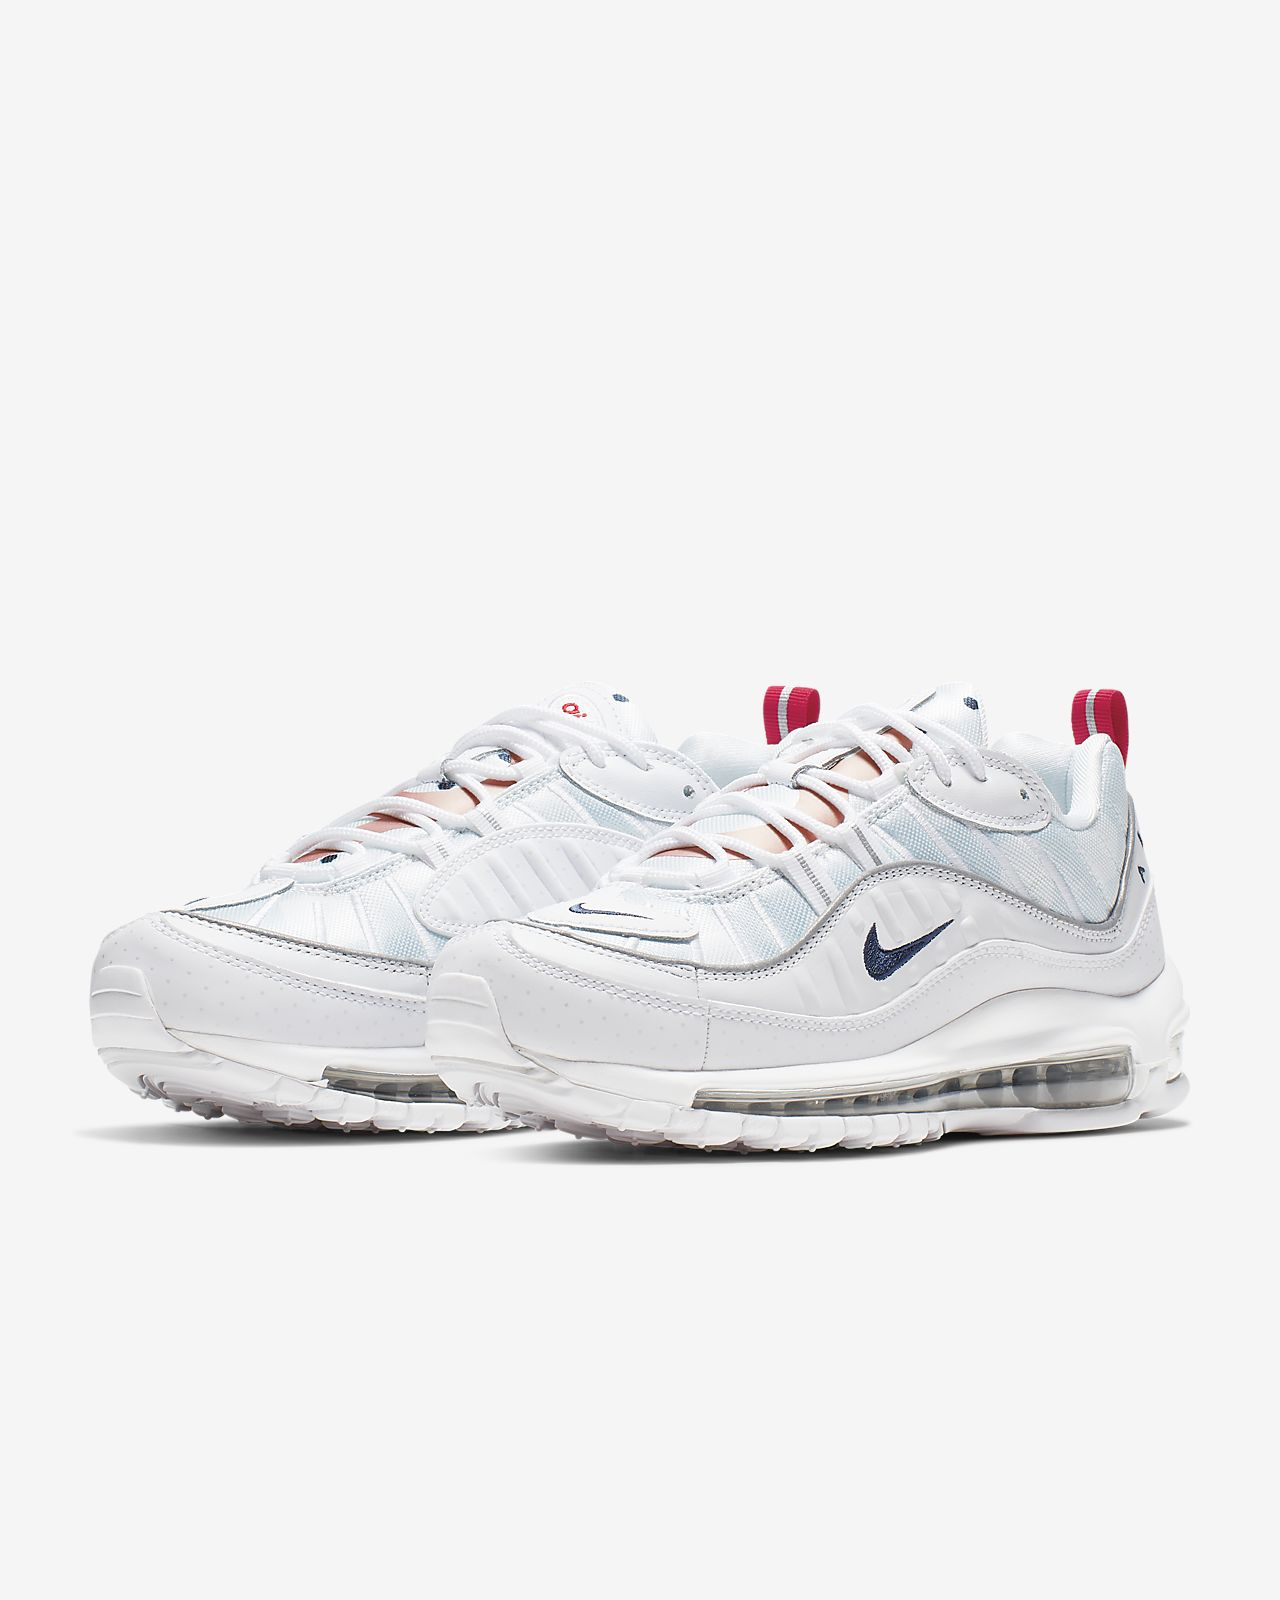 a4c1601825 Nike Air Max 98 Premium Unité Totale Women's Shoe. Nike.com GB